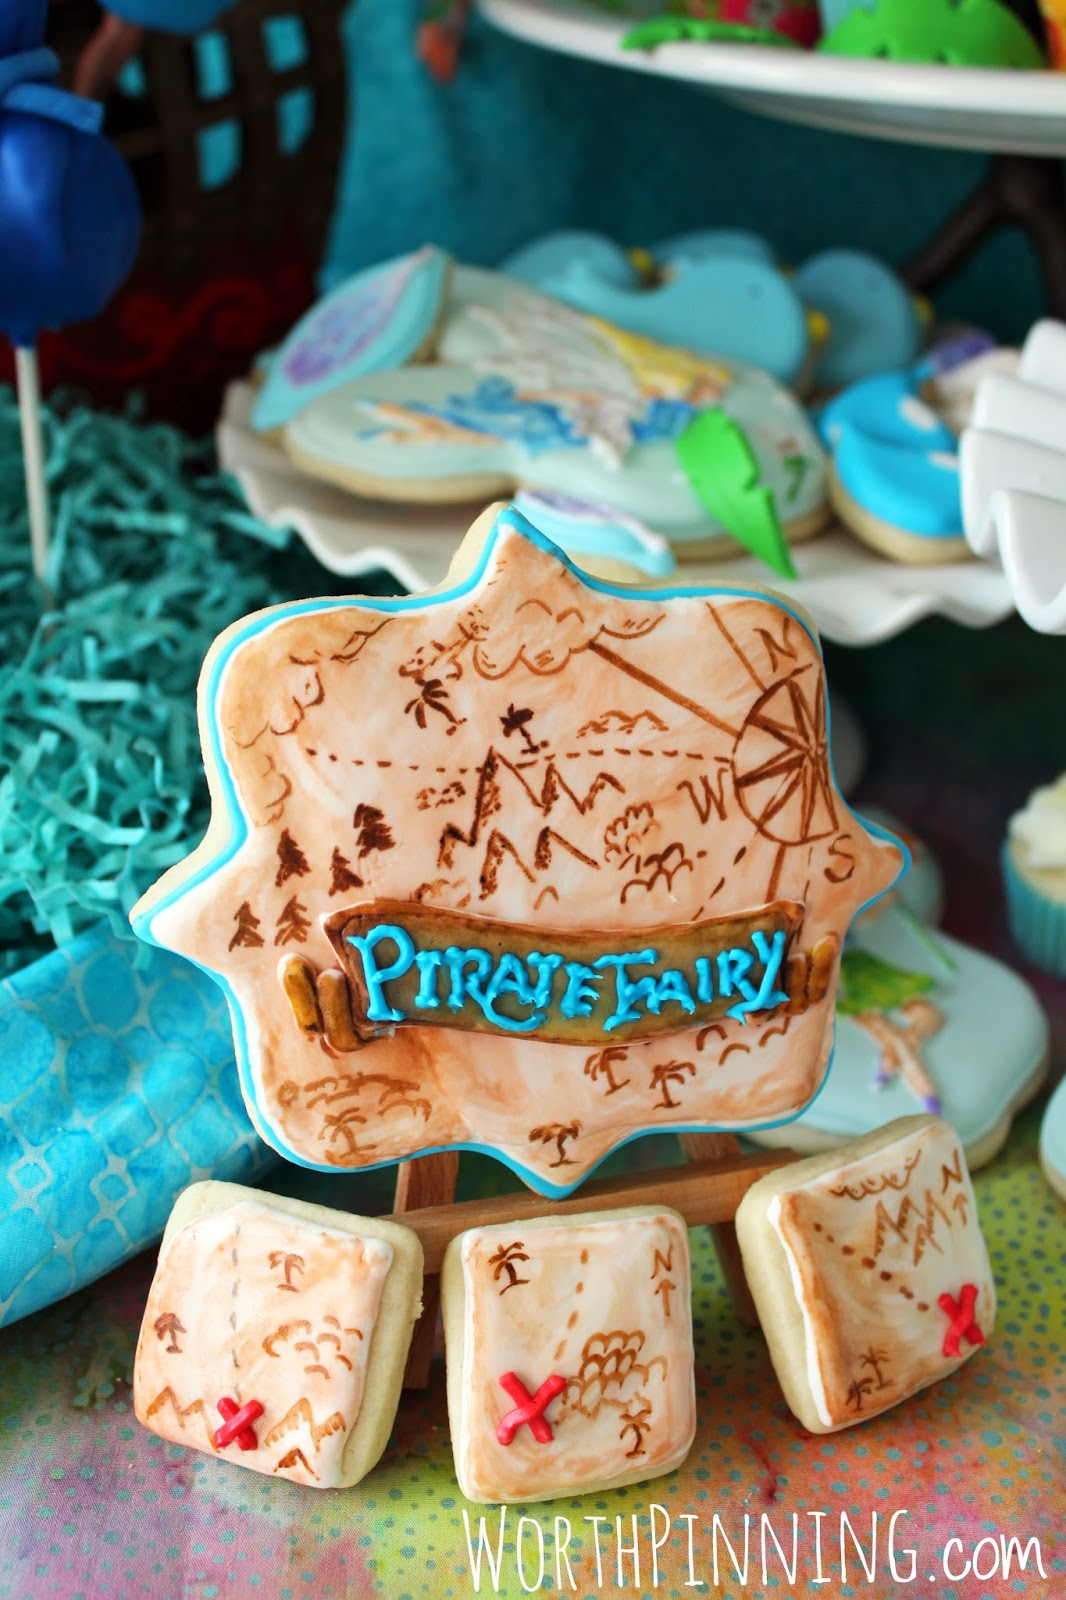 Worth Pinning Pirate Fairy Dessert Party